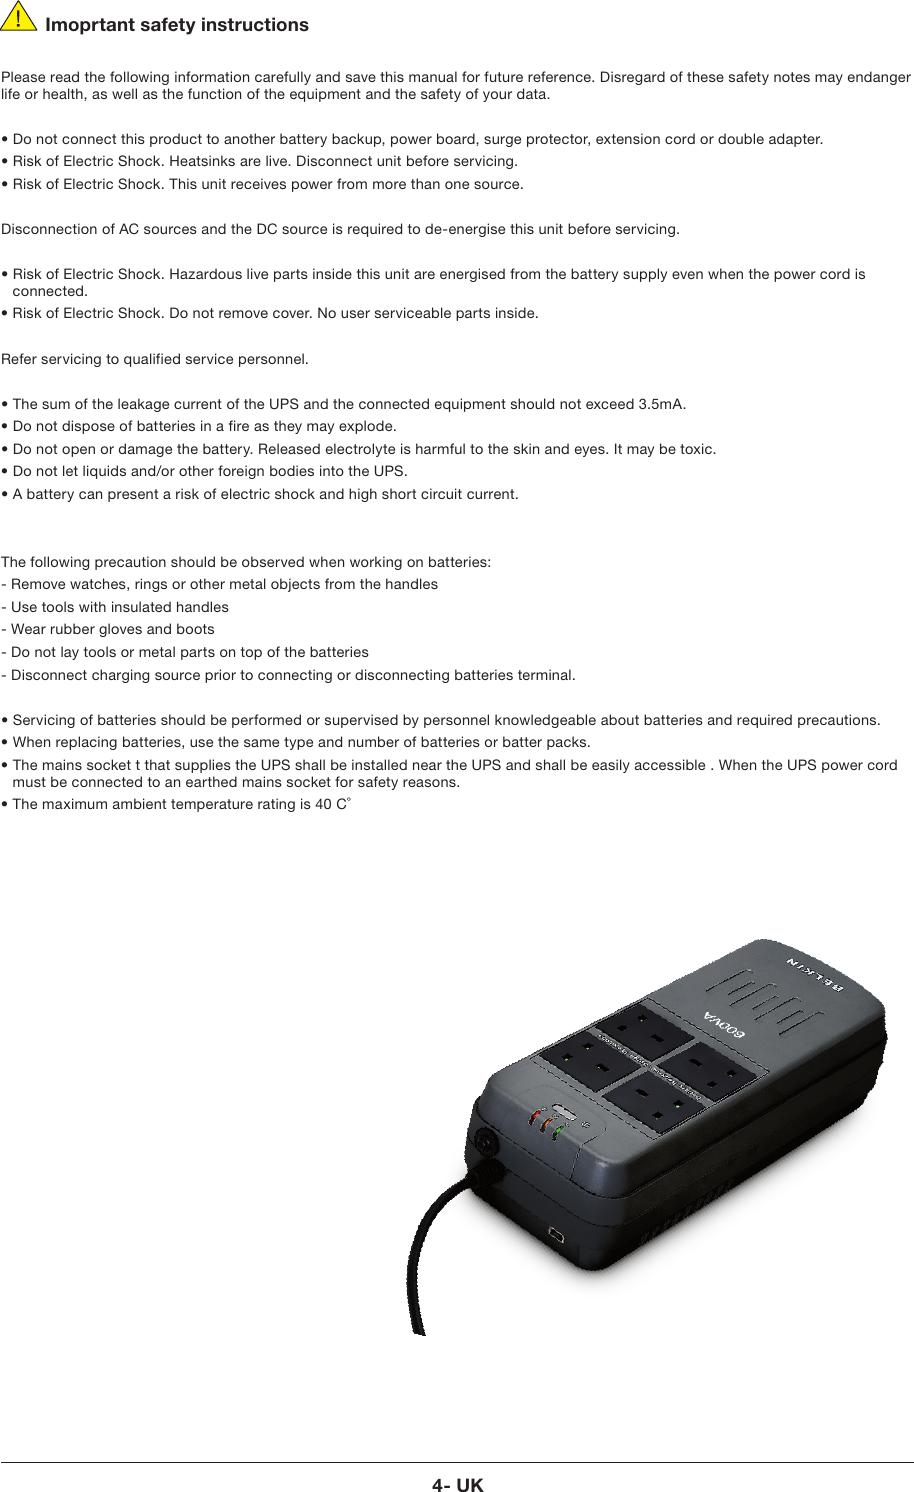 Belkin F6H400Ukusb Users Manual